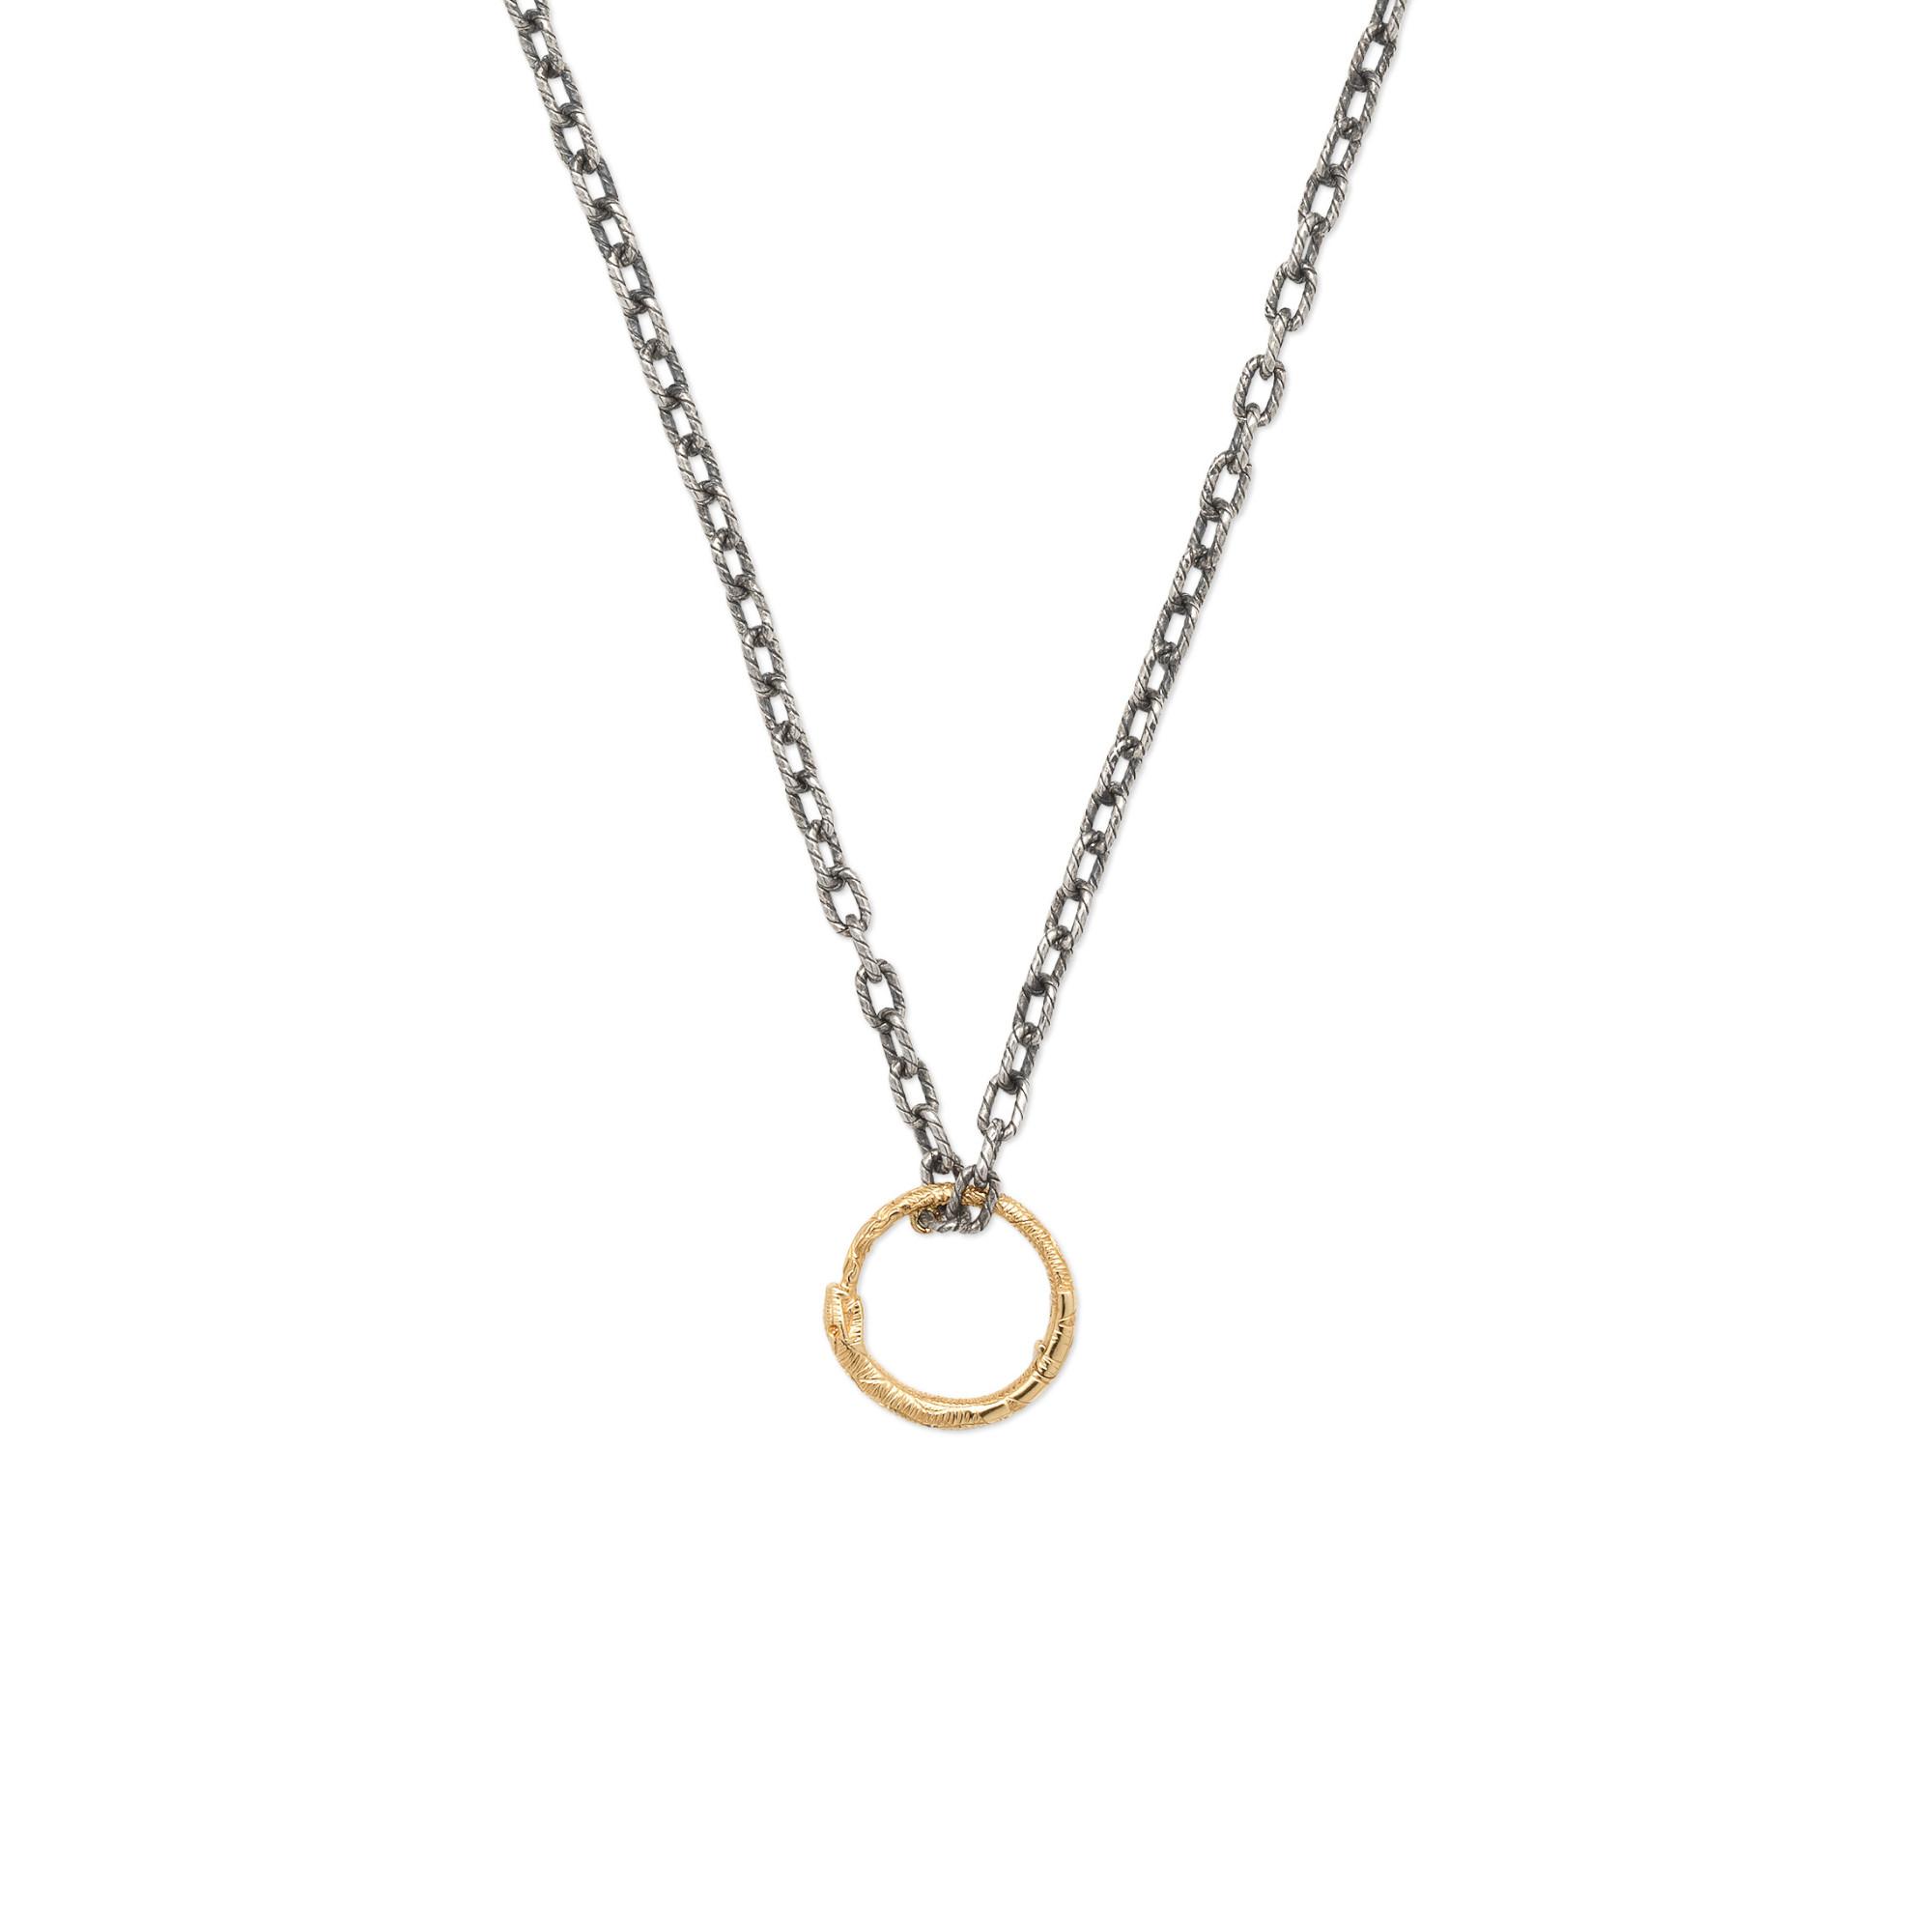 Collana GUCCI Ouroboros pendente anello serpente oro